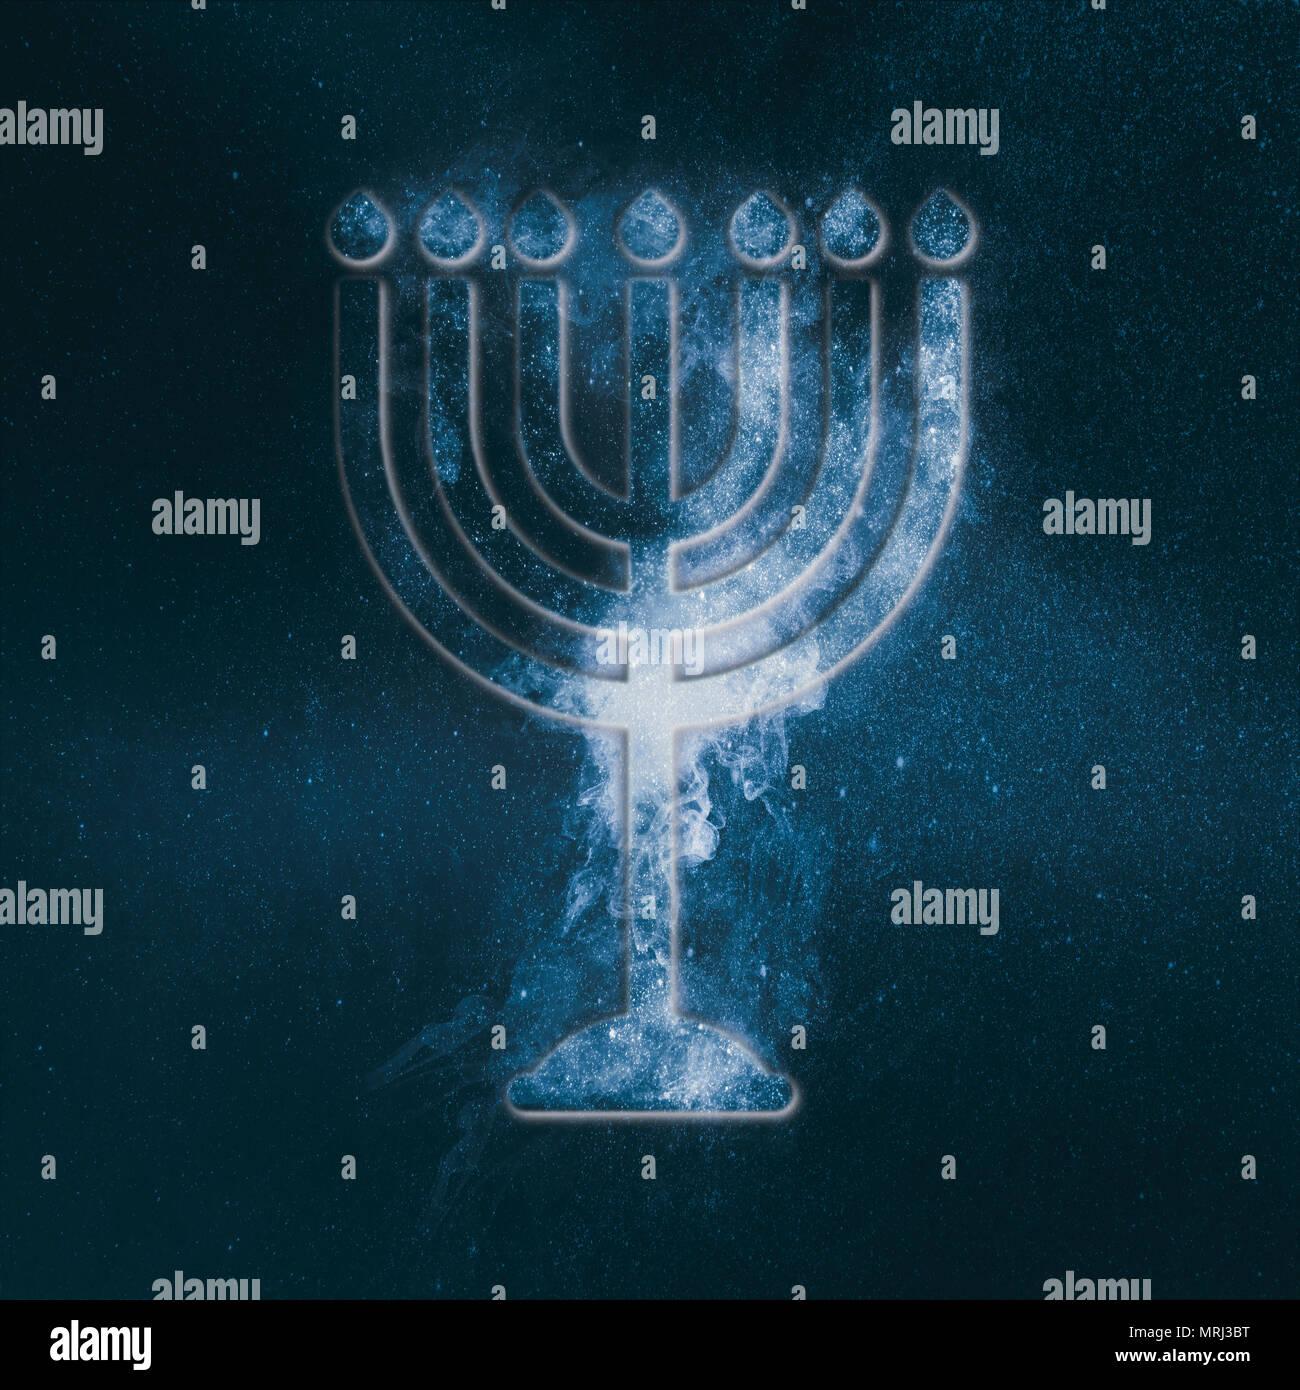 Hanukkah menorah symbol. Menorah symbol of Judaism. Abstract night sky background. - Stock Image